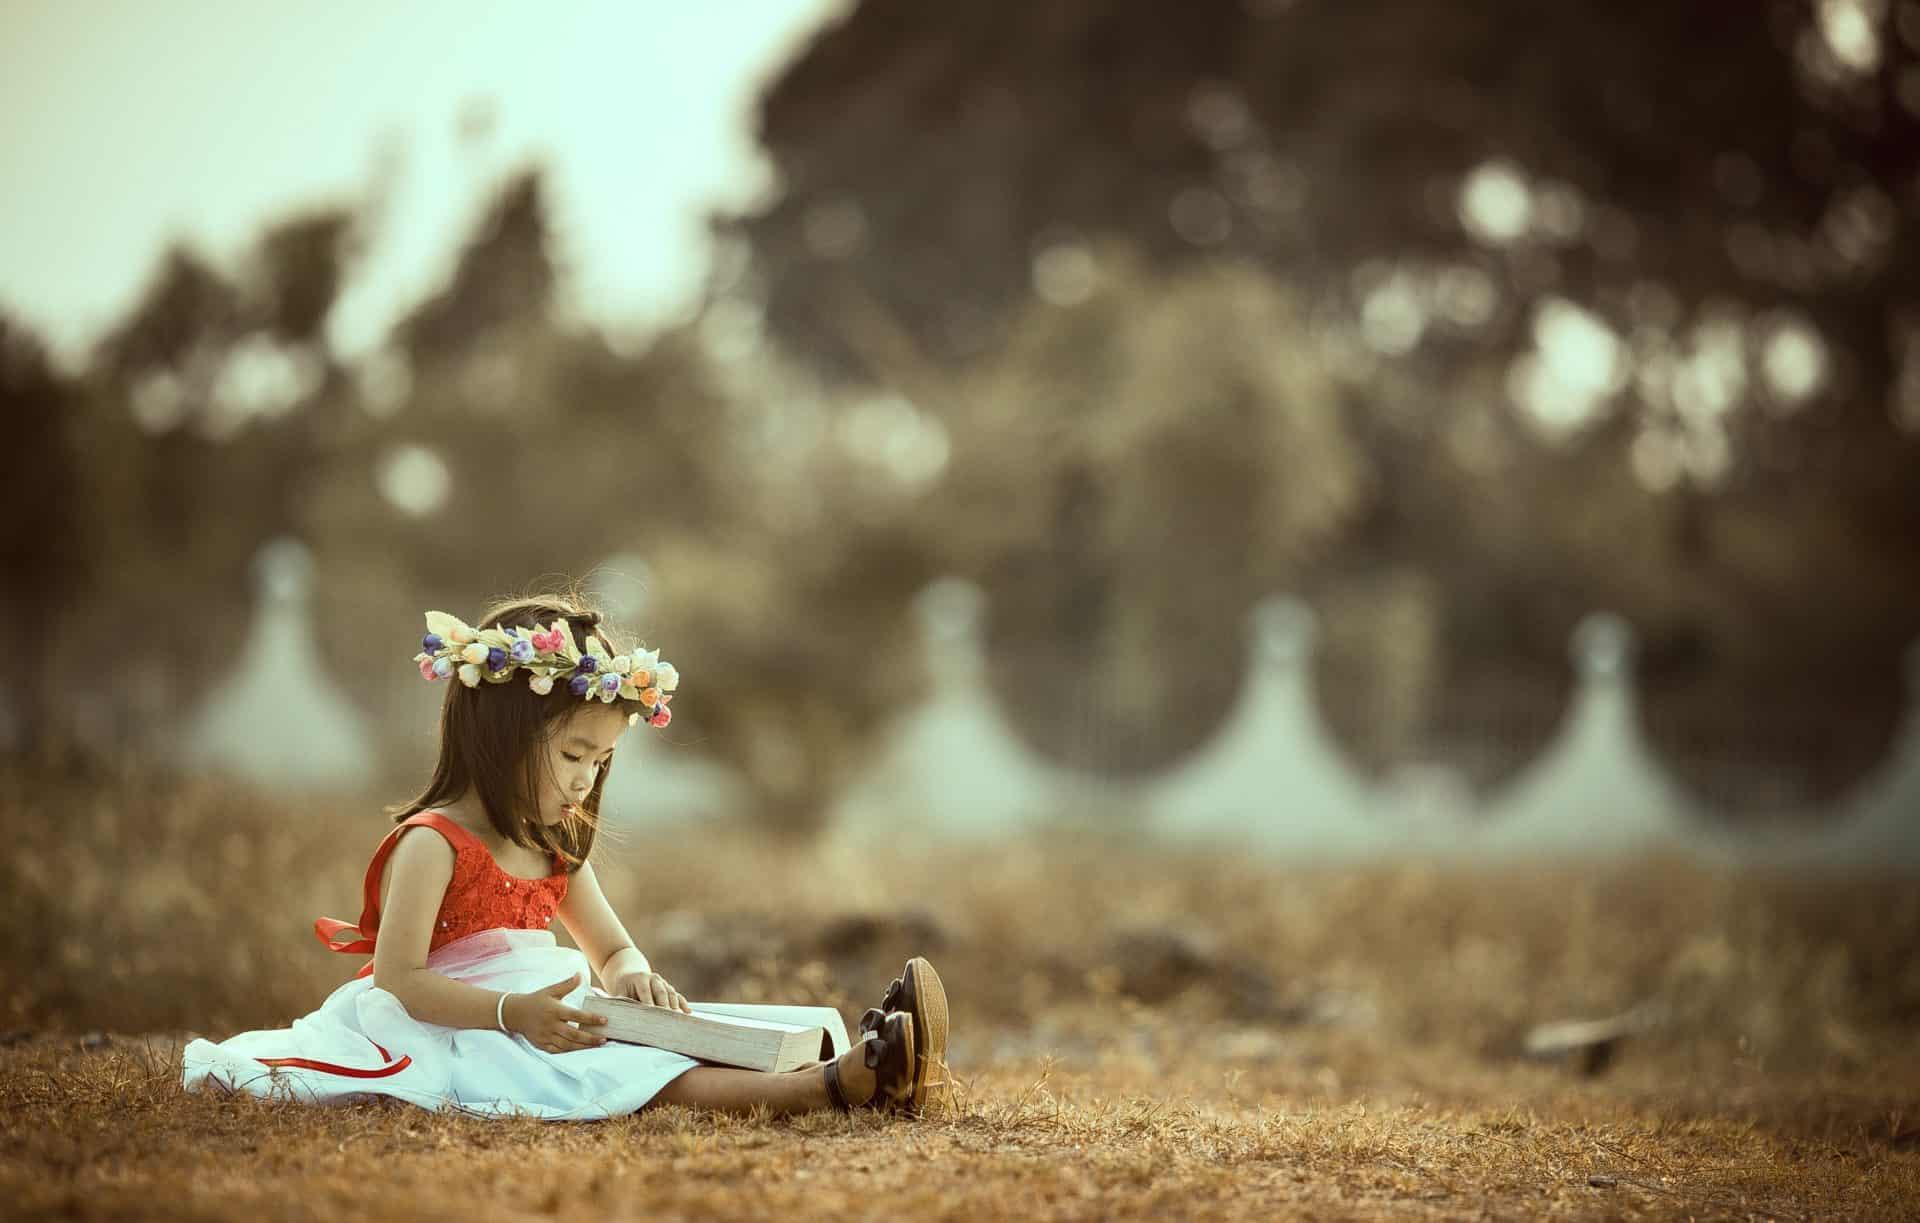 Come Follow Me 4/1/2019 – Devotionals & FHE for Children